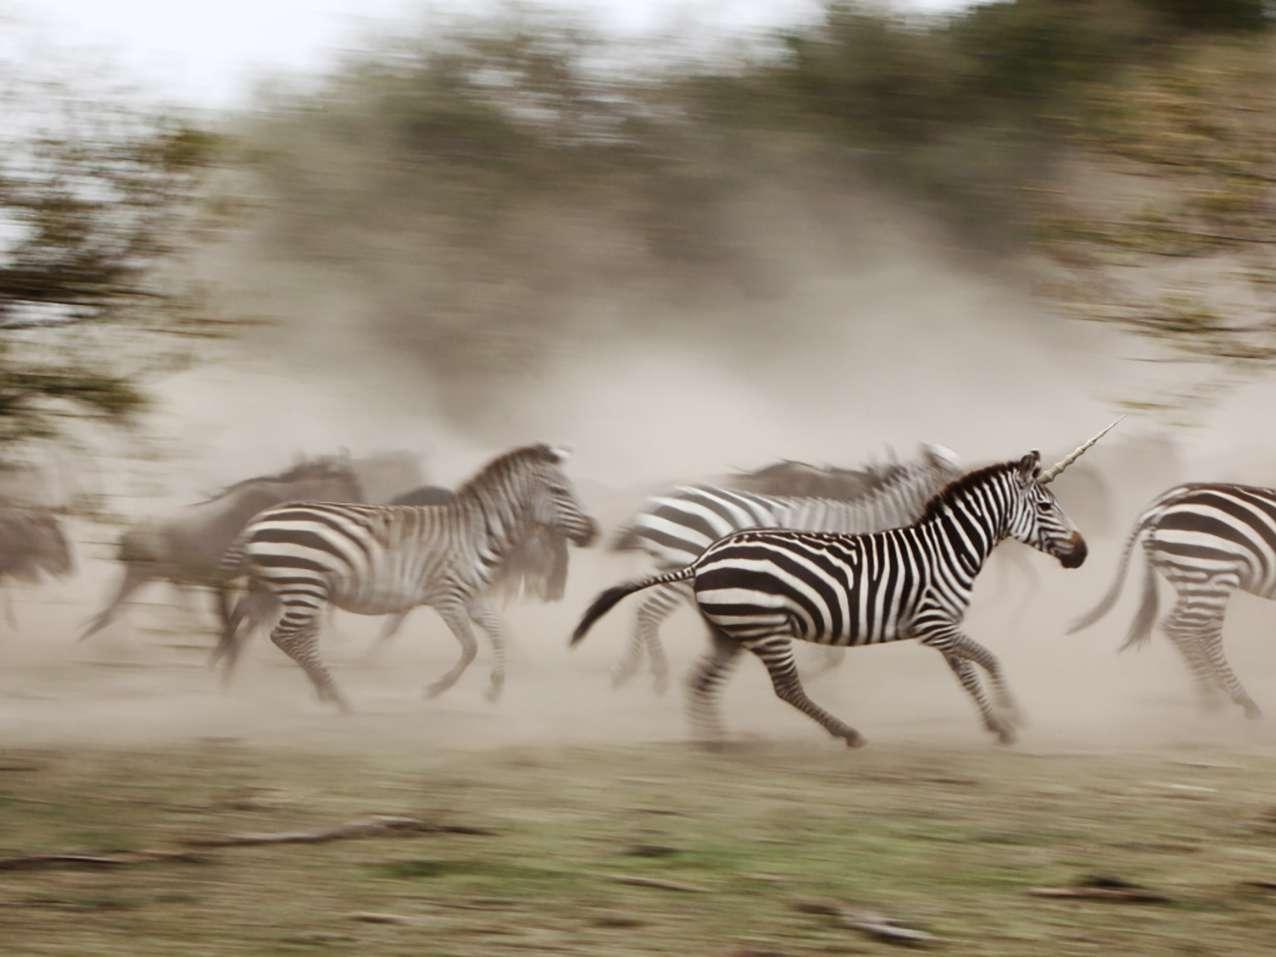 We hunt unicorns, but must also value technology zebras